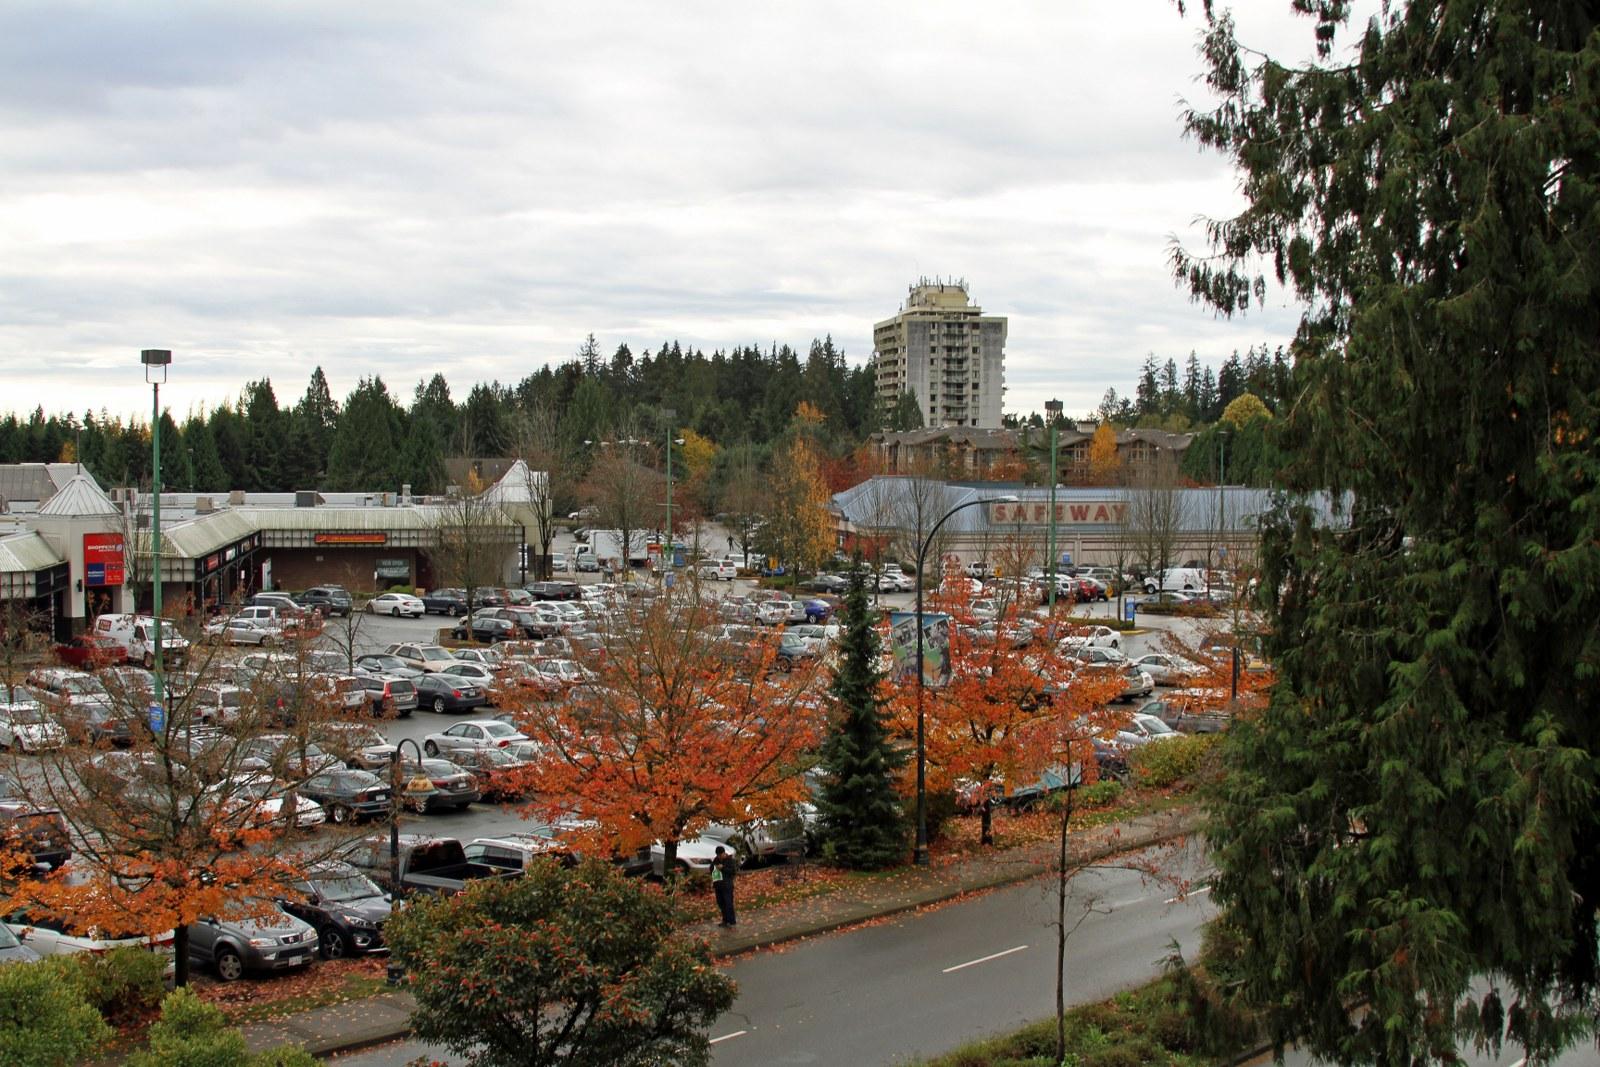 Across the Lynn Valley Shopping Centre